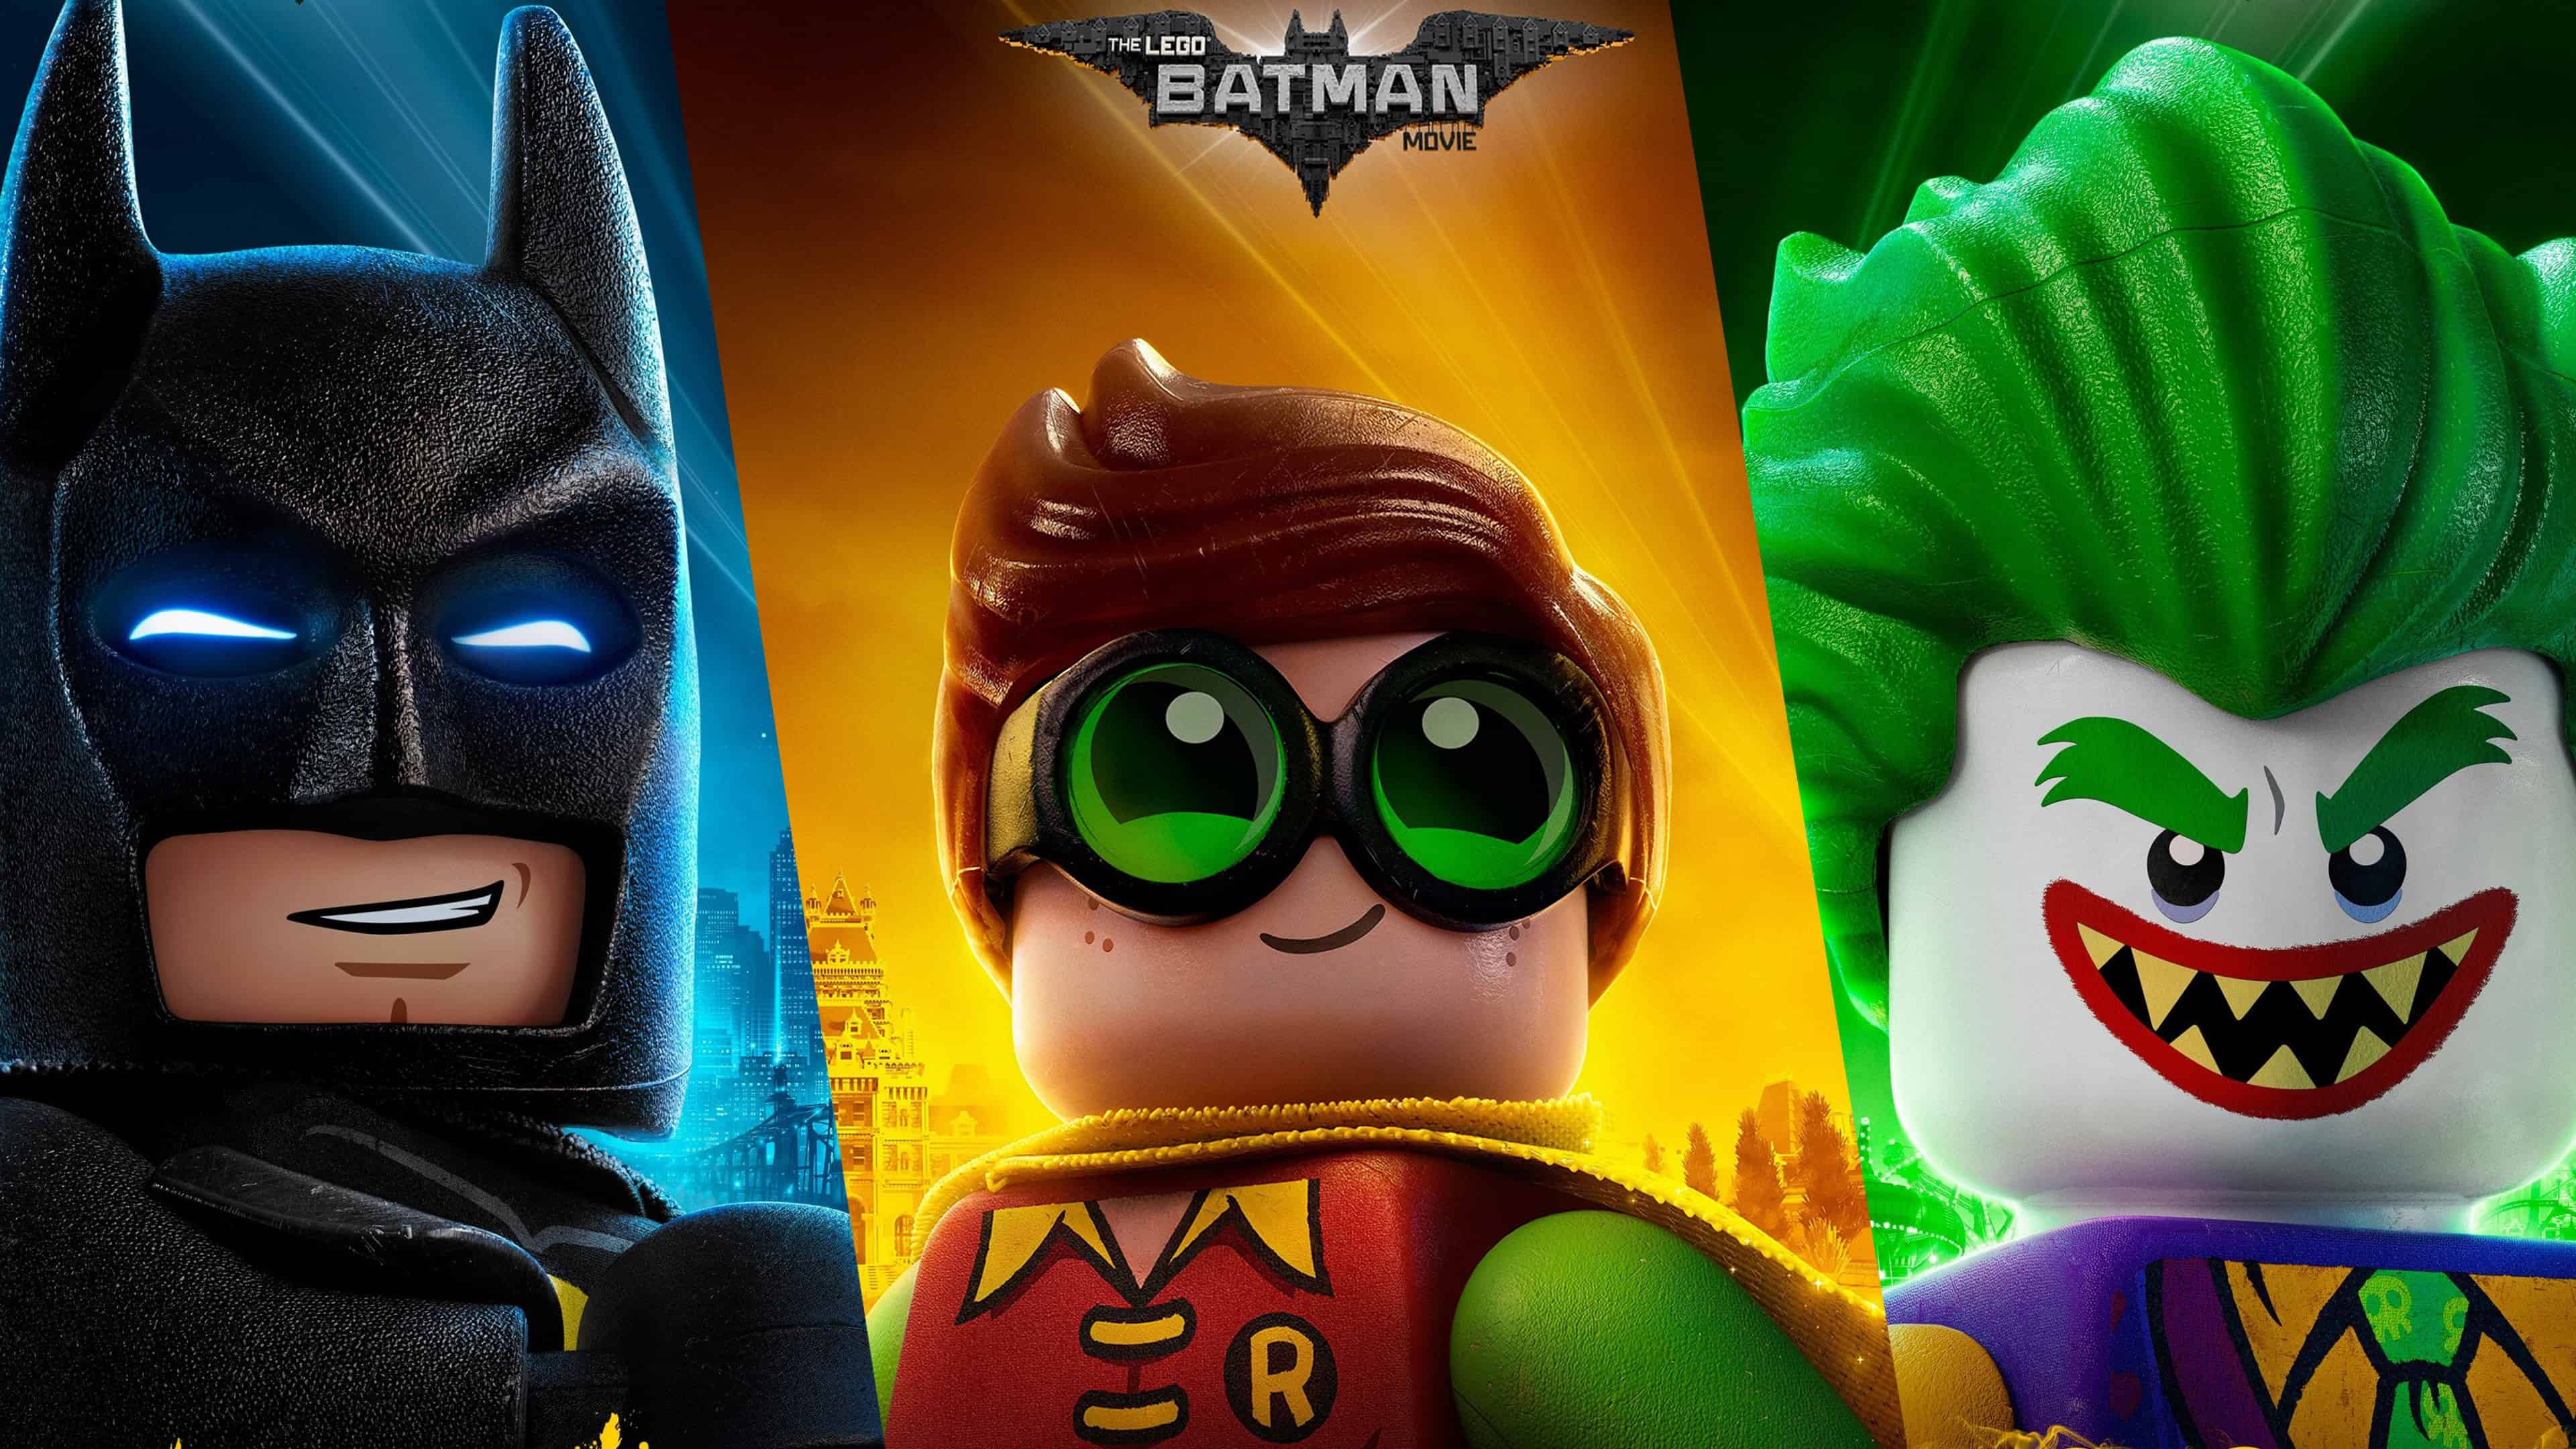 The Lego Batman Movie Joker Robin and Batman UHD 4K Wallpaper | Pixelz